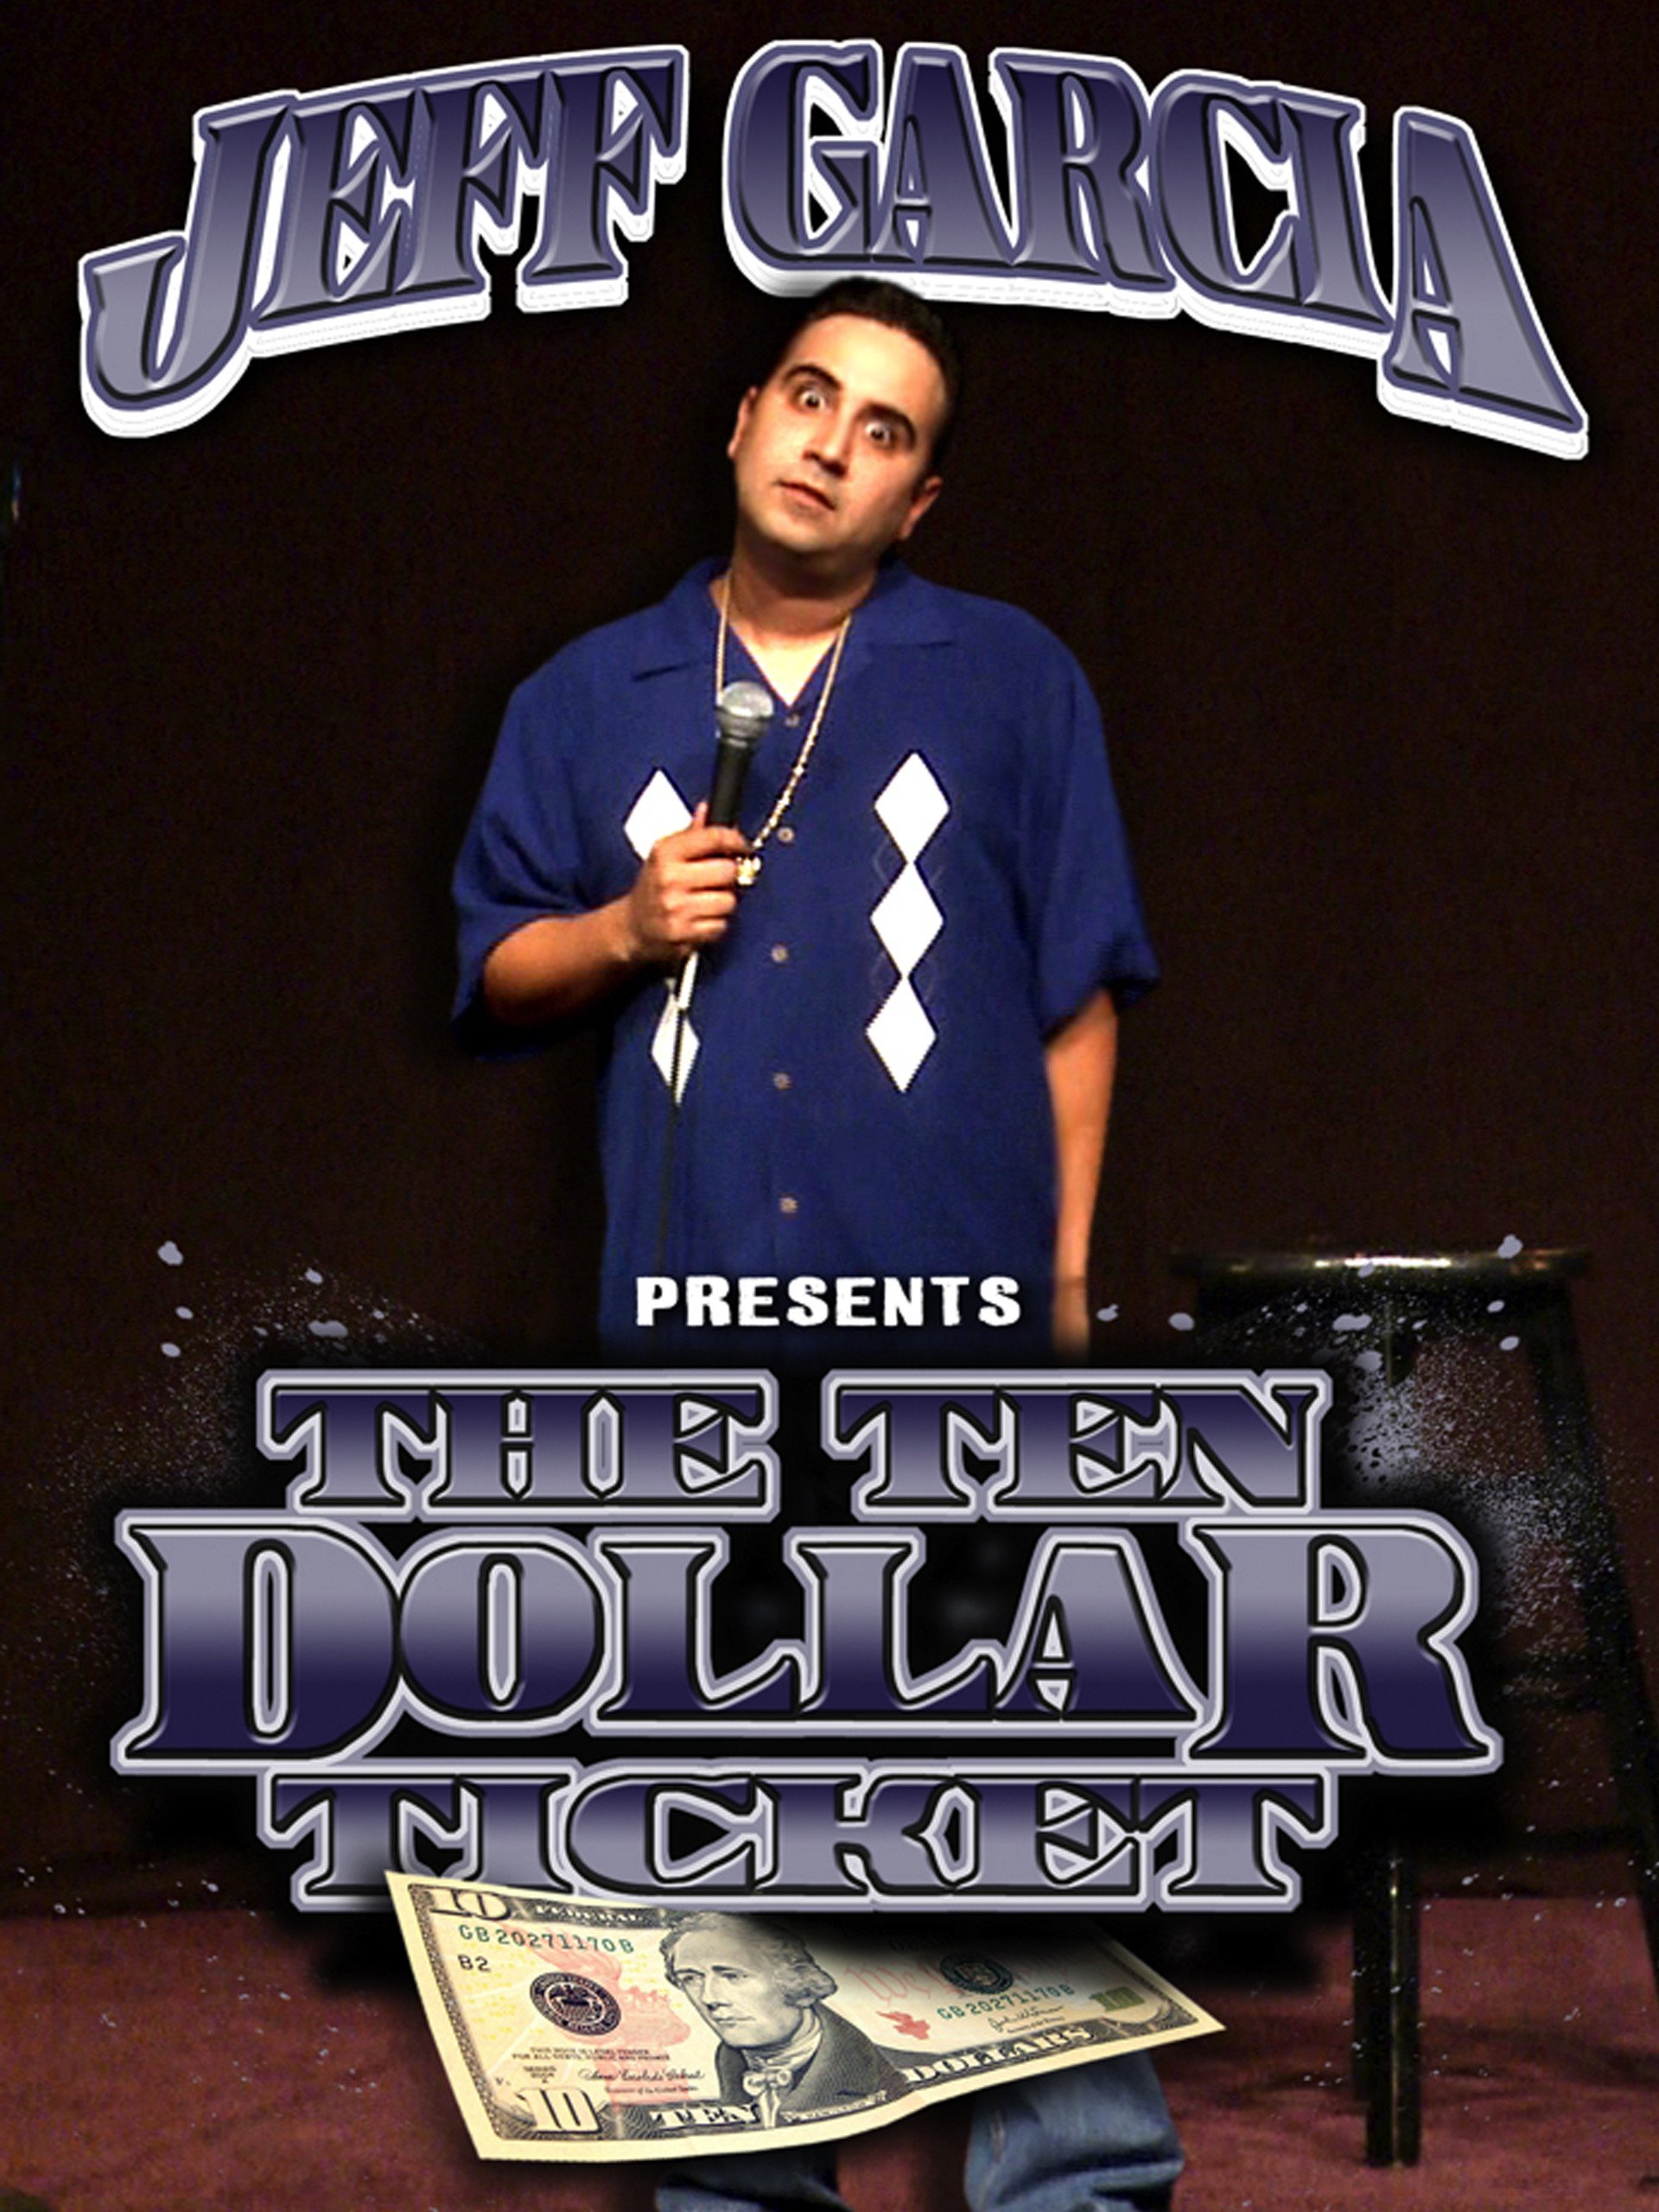 Jeff Garcia: The Ten Dollar Ticket